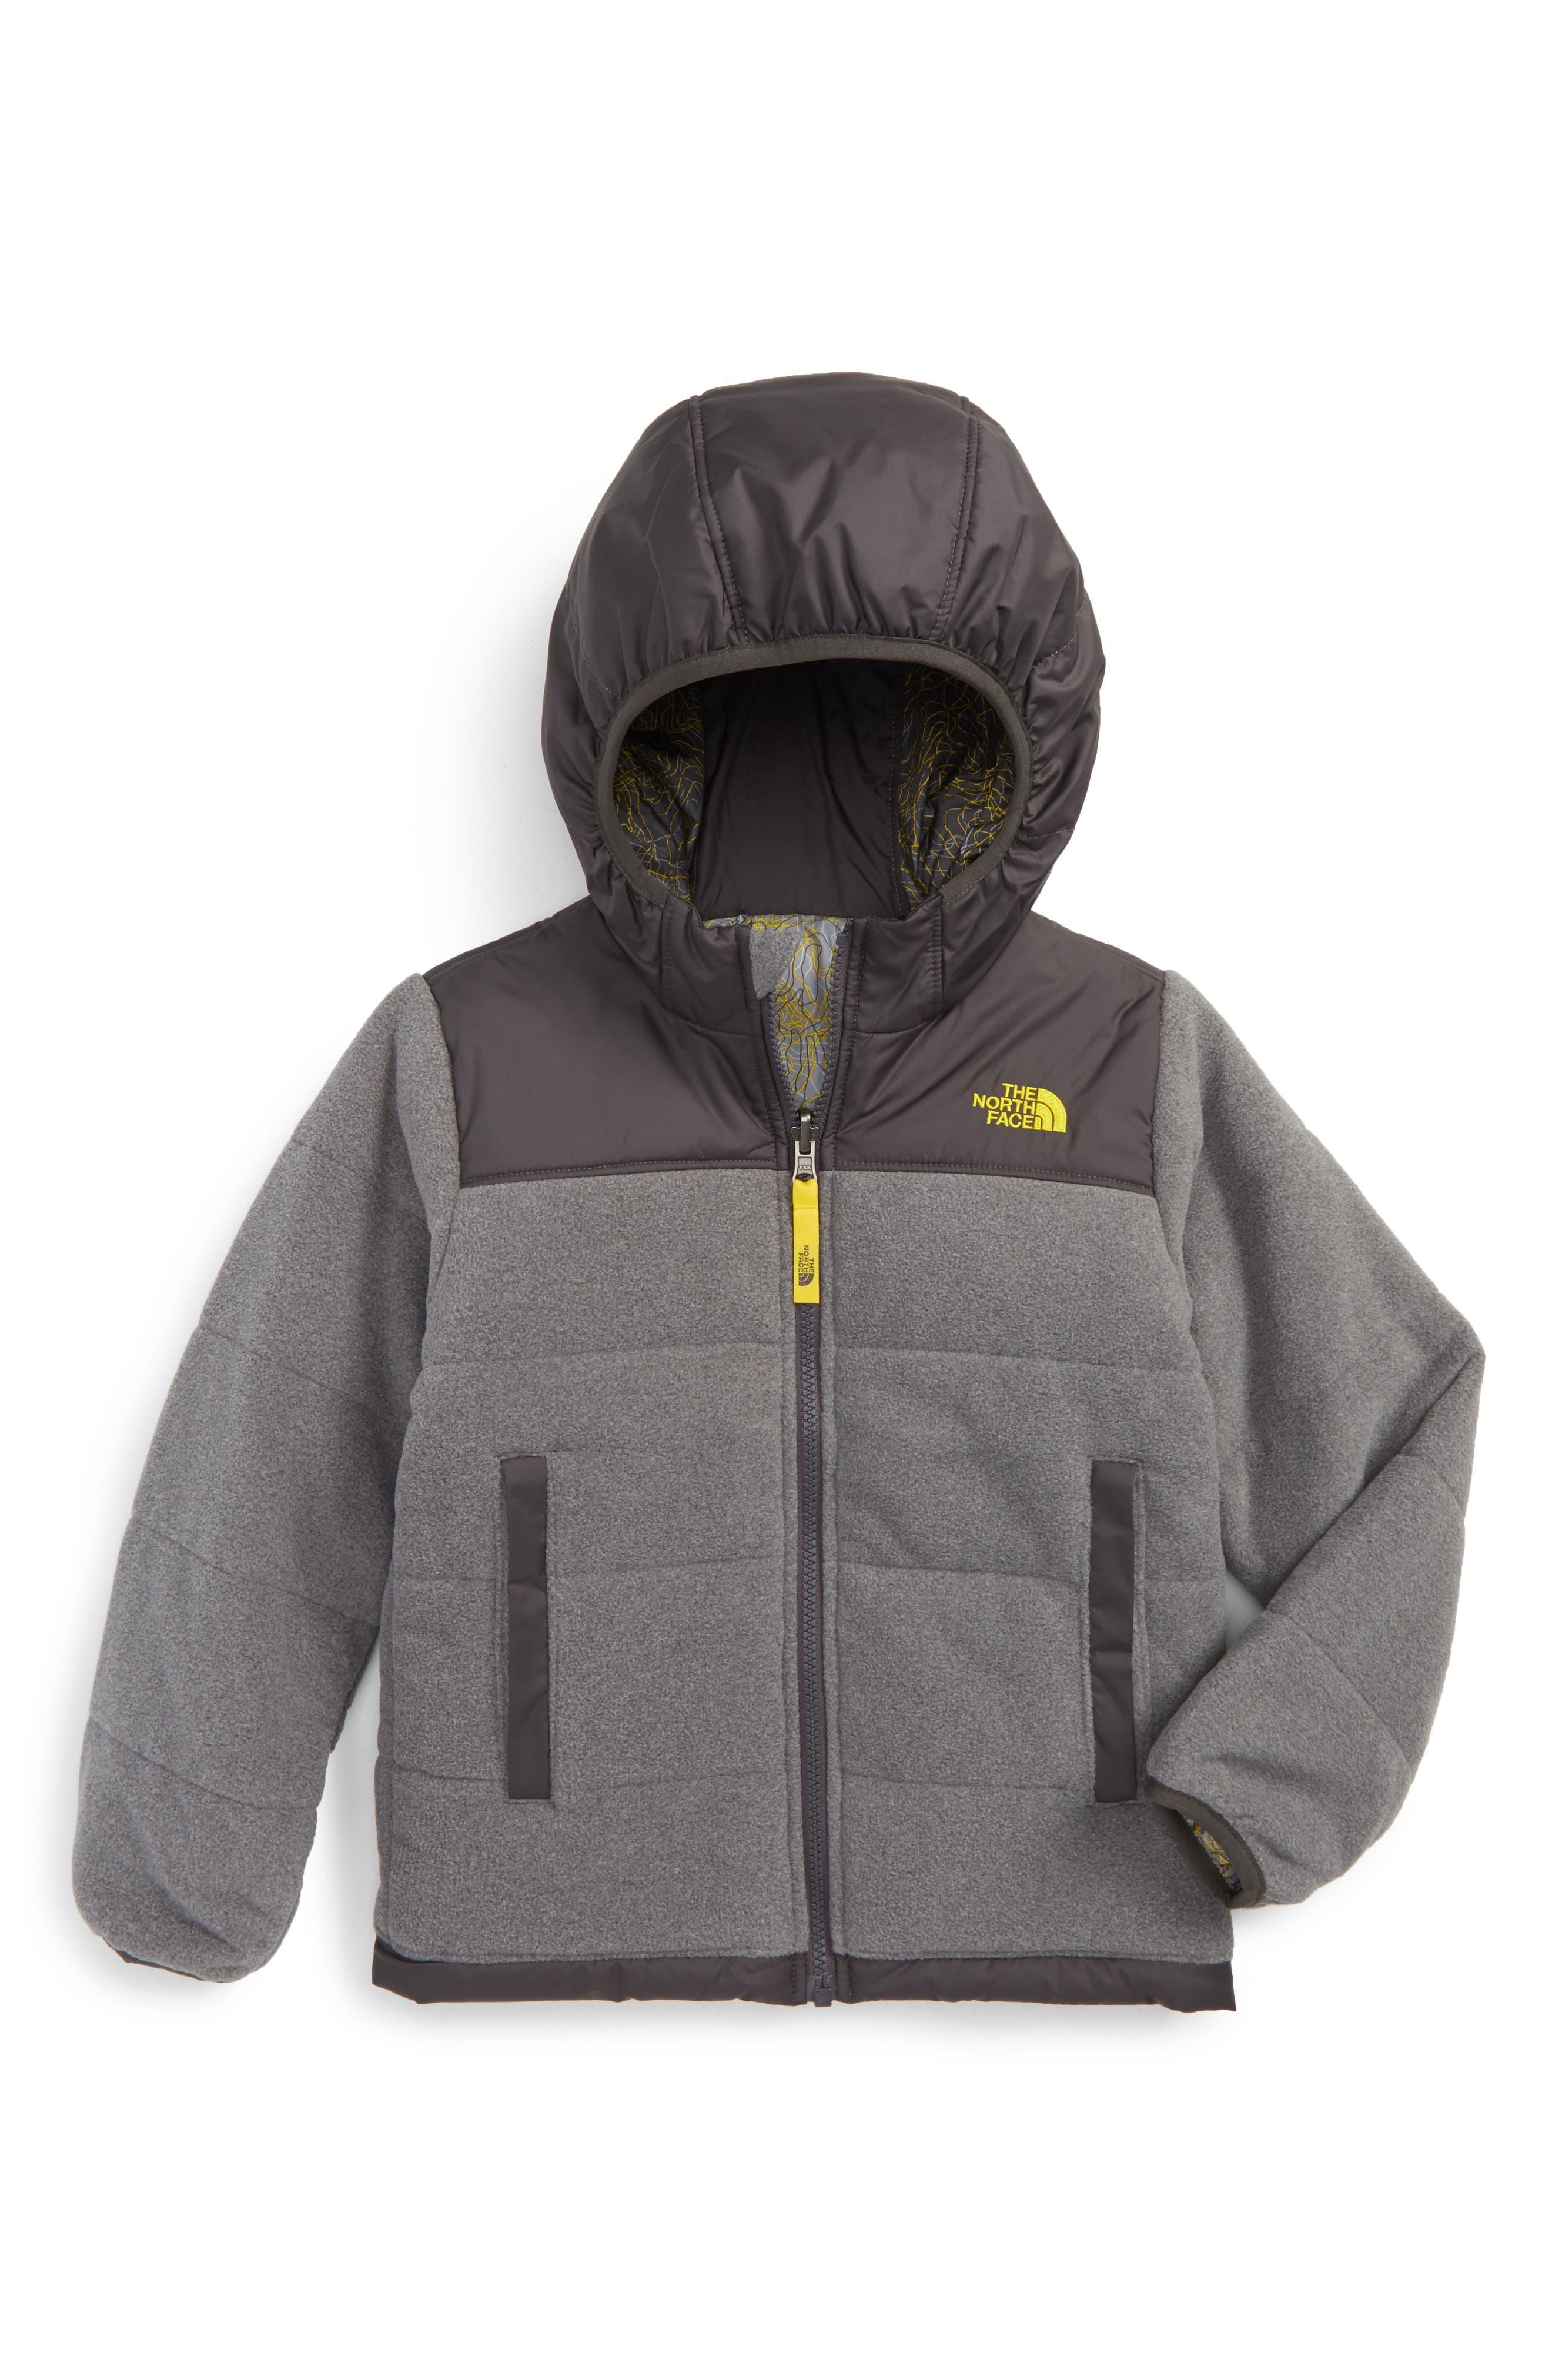 Alternate Image 1 Selected - The North Face True or False Reversible Jacket (Toddler Boys & Little Boys)